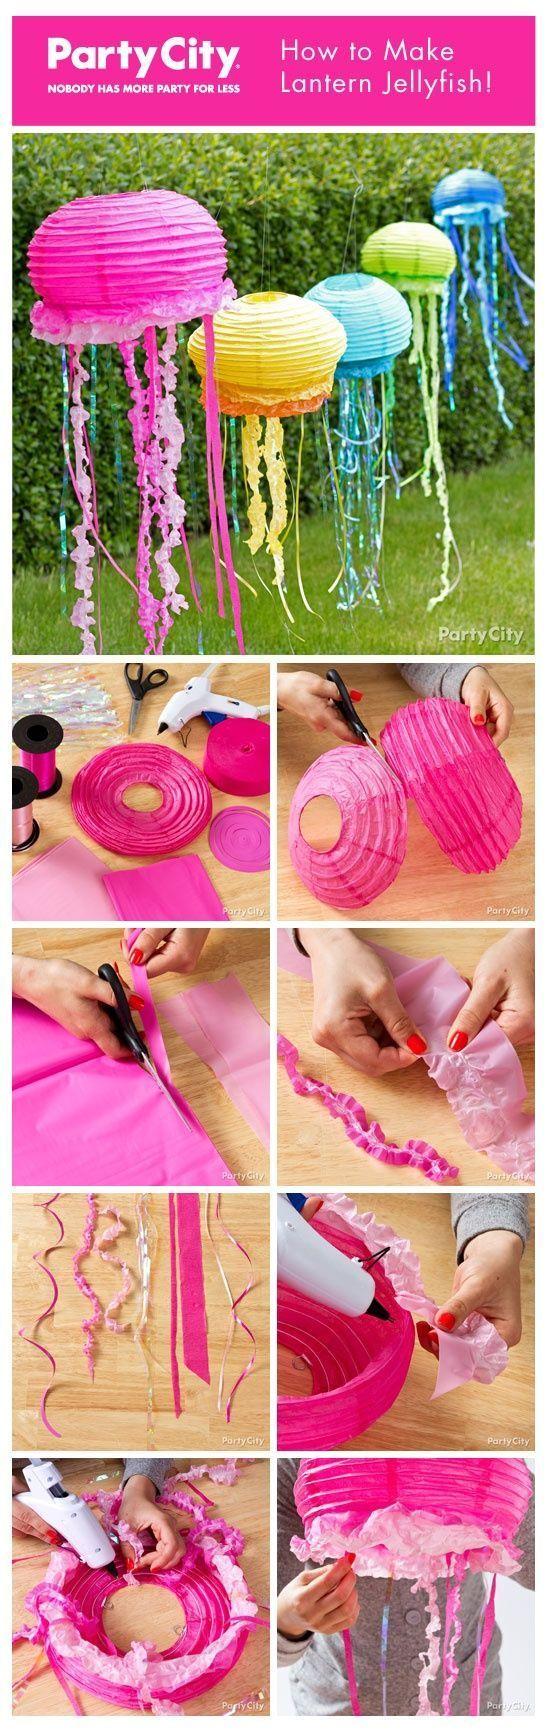 Birthday party craft idea -  Birthday party craft idea –  #Bastelidee #Geburtstagsfeier  - #birthday #catnoir #Craft #frozenelsa #handmadehomedecor #homedecoritems #homedecorquotes #idea #miraculousladybug #Onward #party #SpongeBob #WonderPark